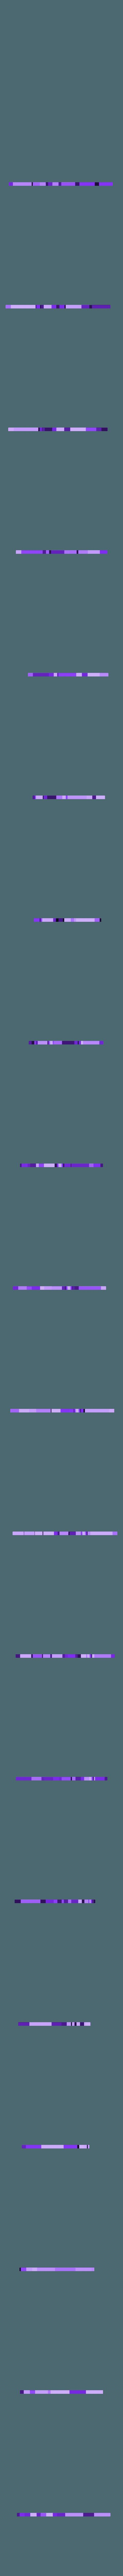 unicorn necklace.STL Download STL file Unicorn Necklace • 3D printer object, TutoSolid